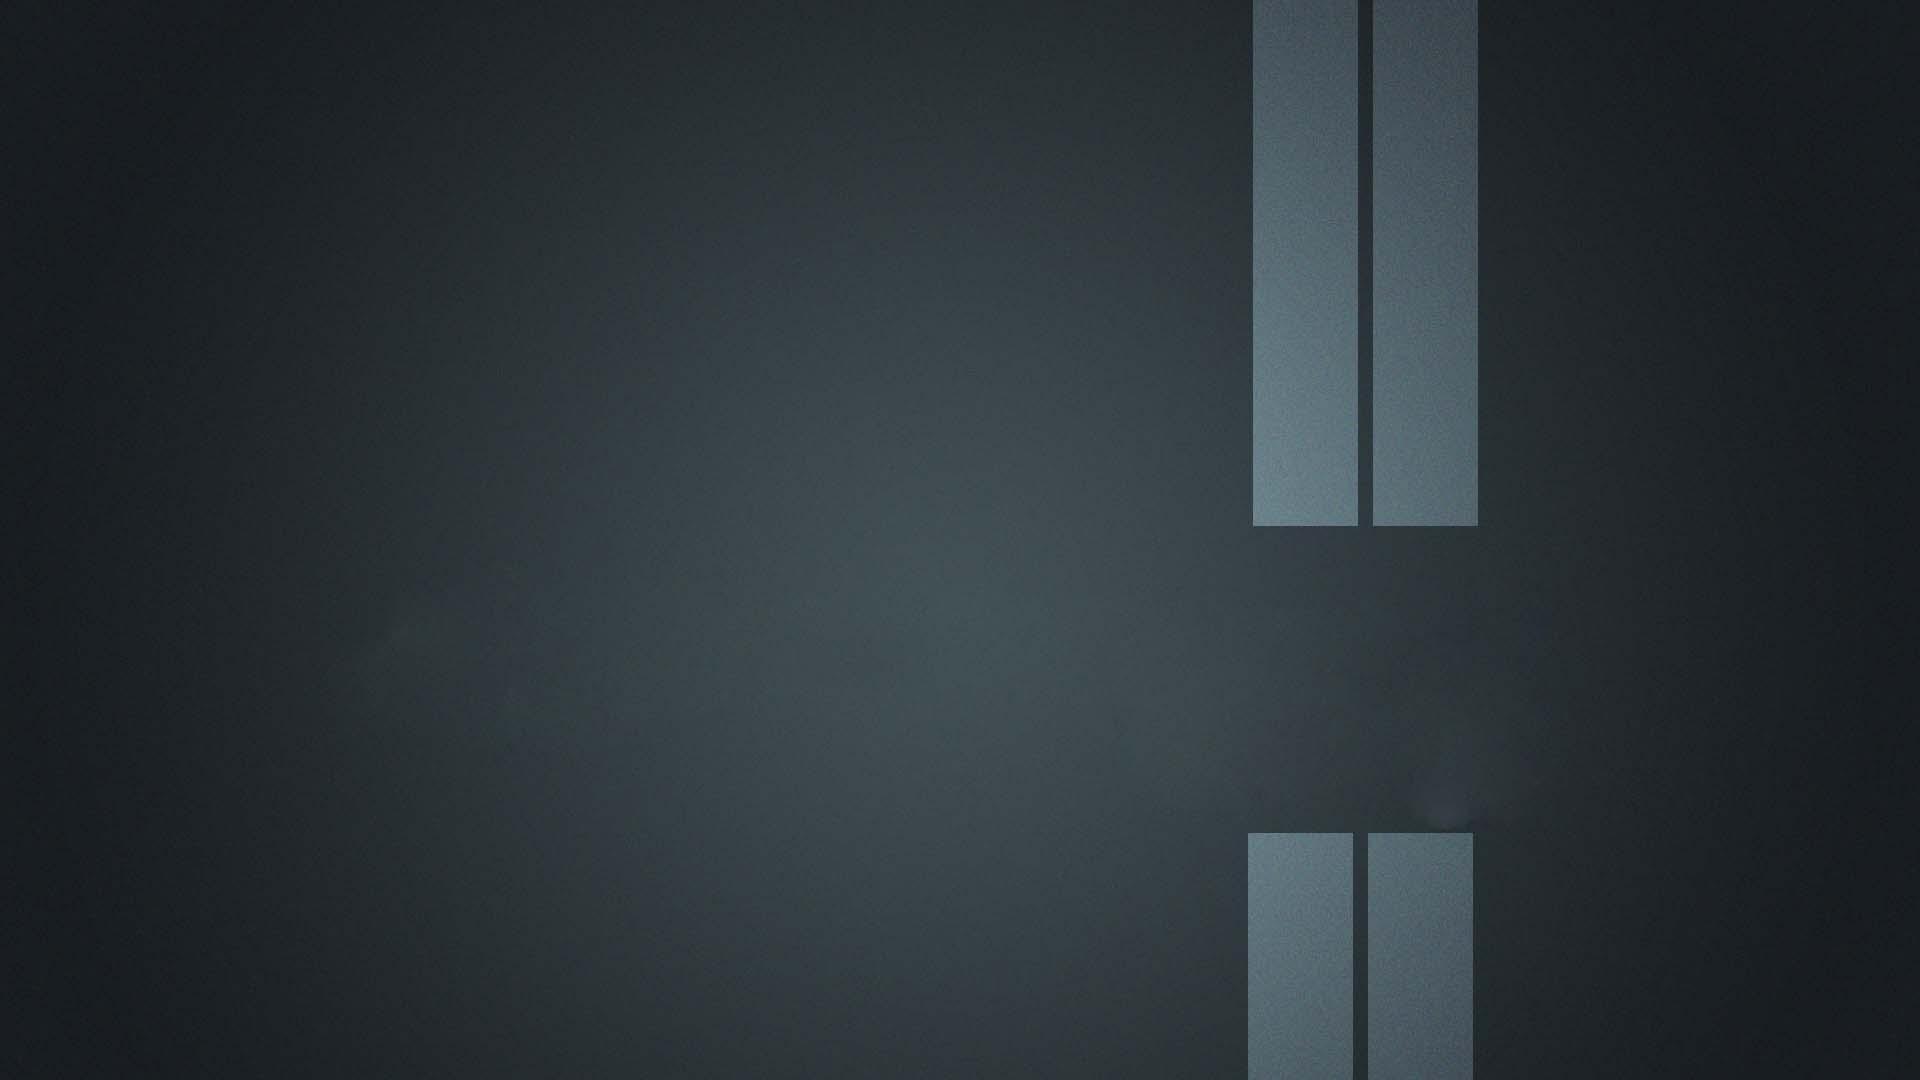 plain desktop background hd wallpapers 1920x1080